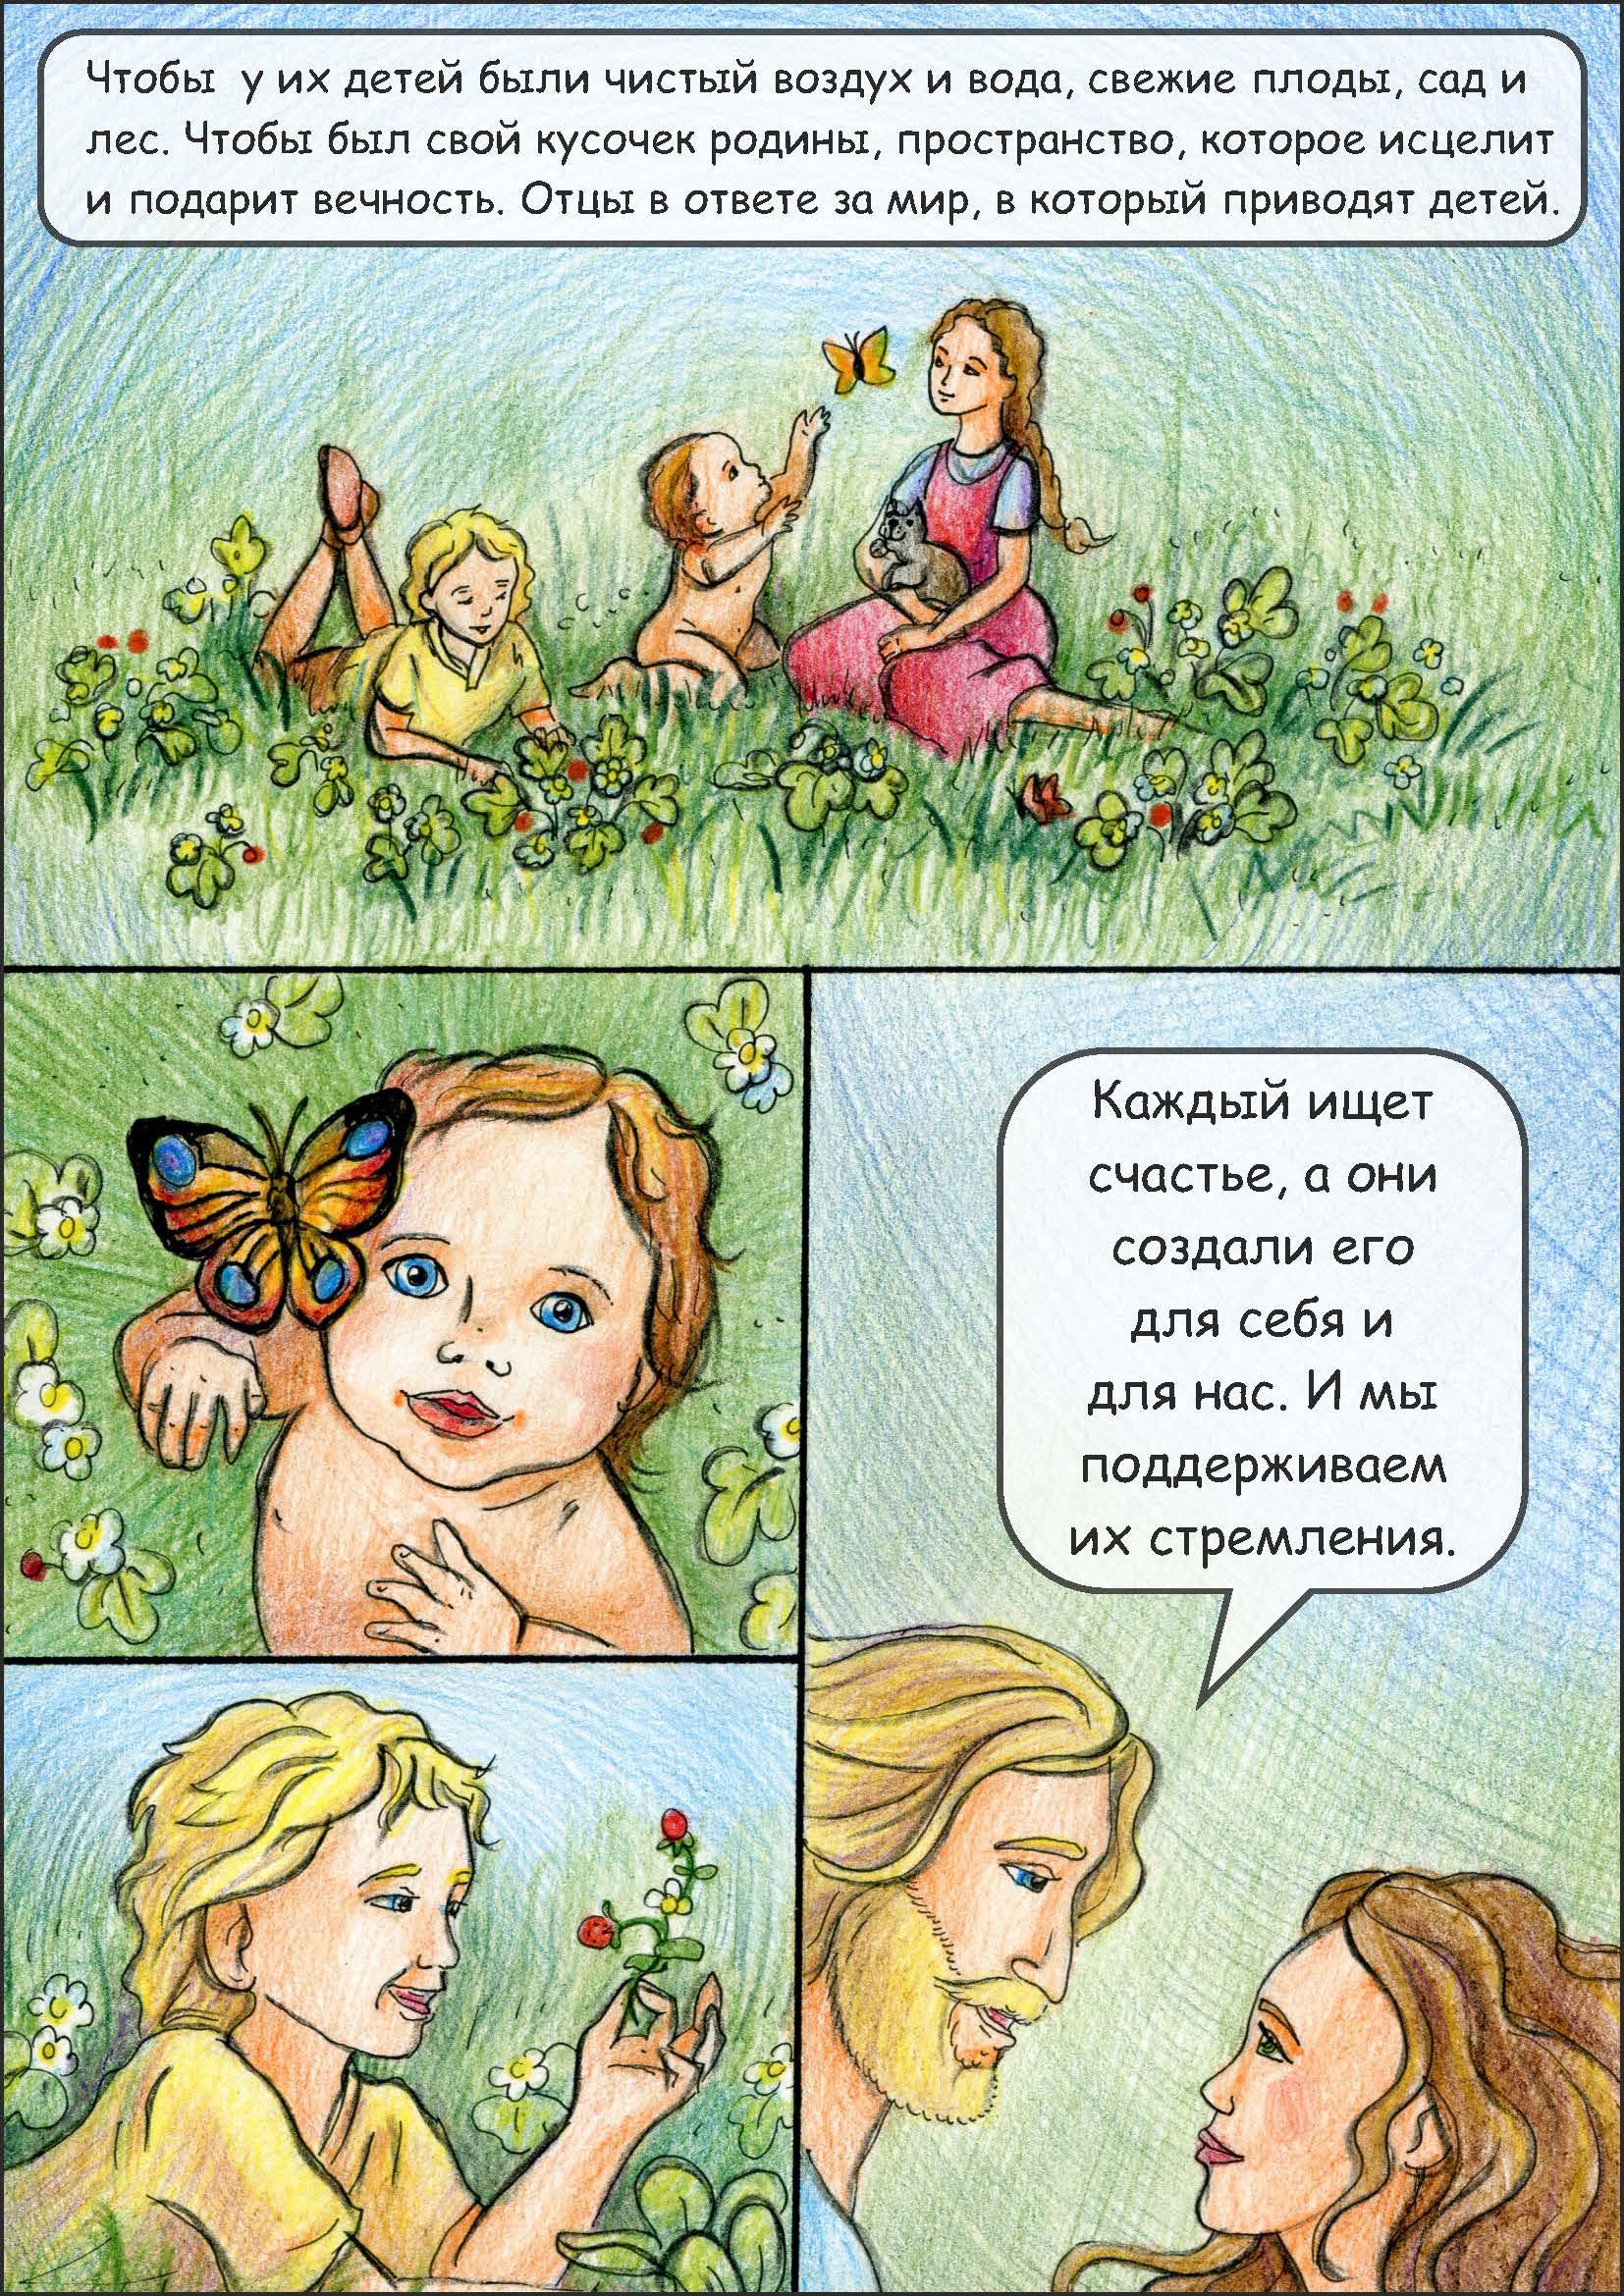 Анна Гейдебрехт. Комикс Зовущая мечта (18).jpg